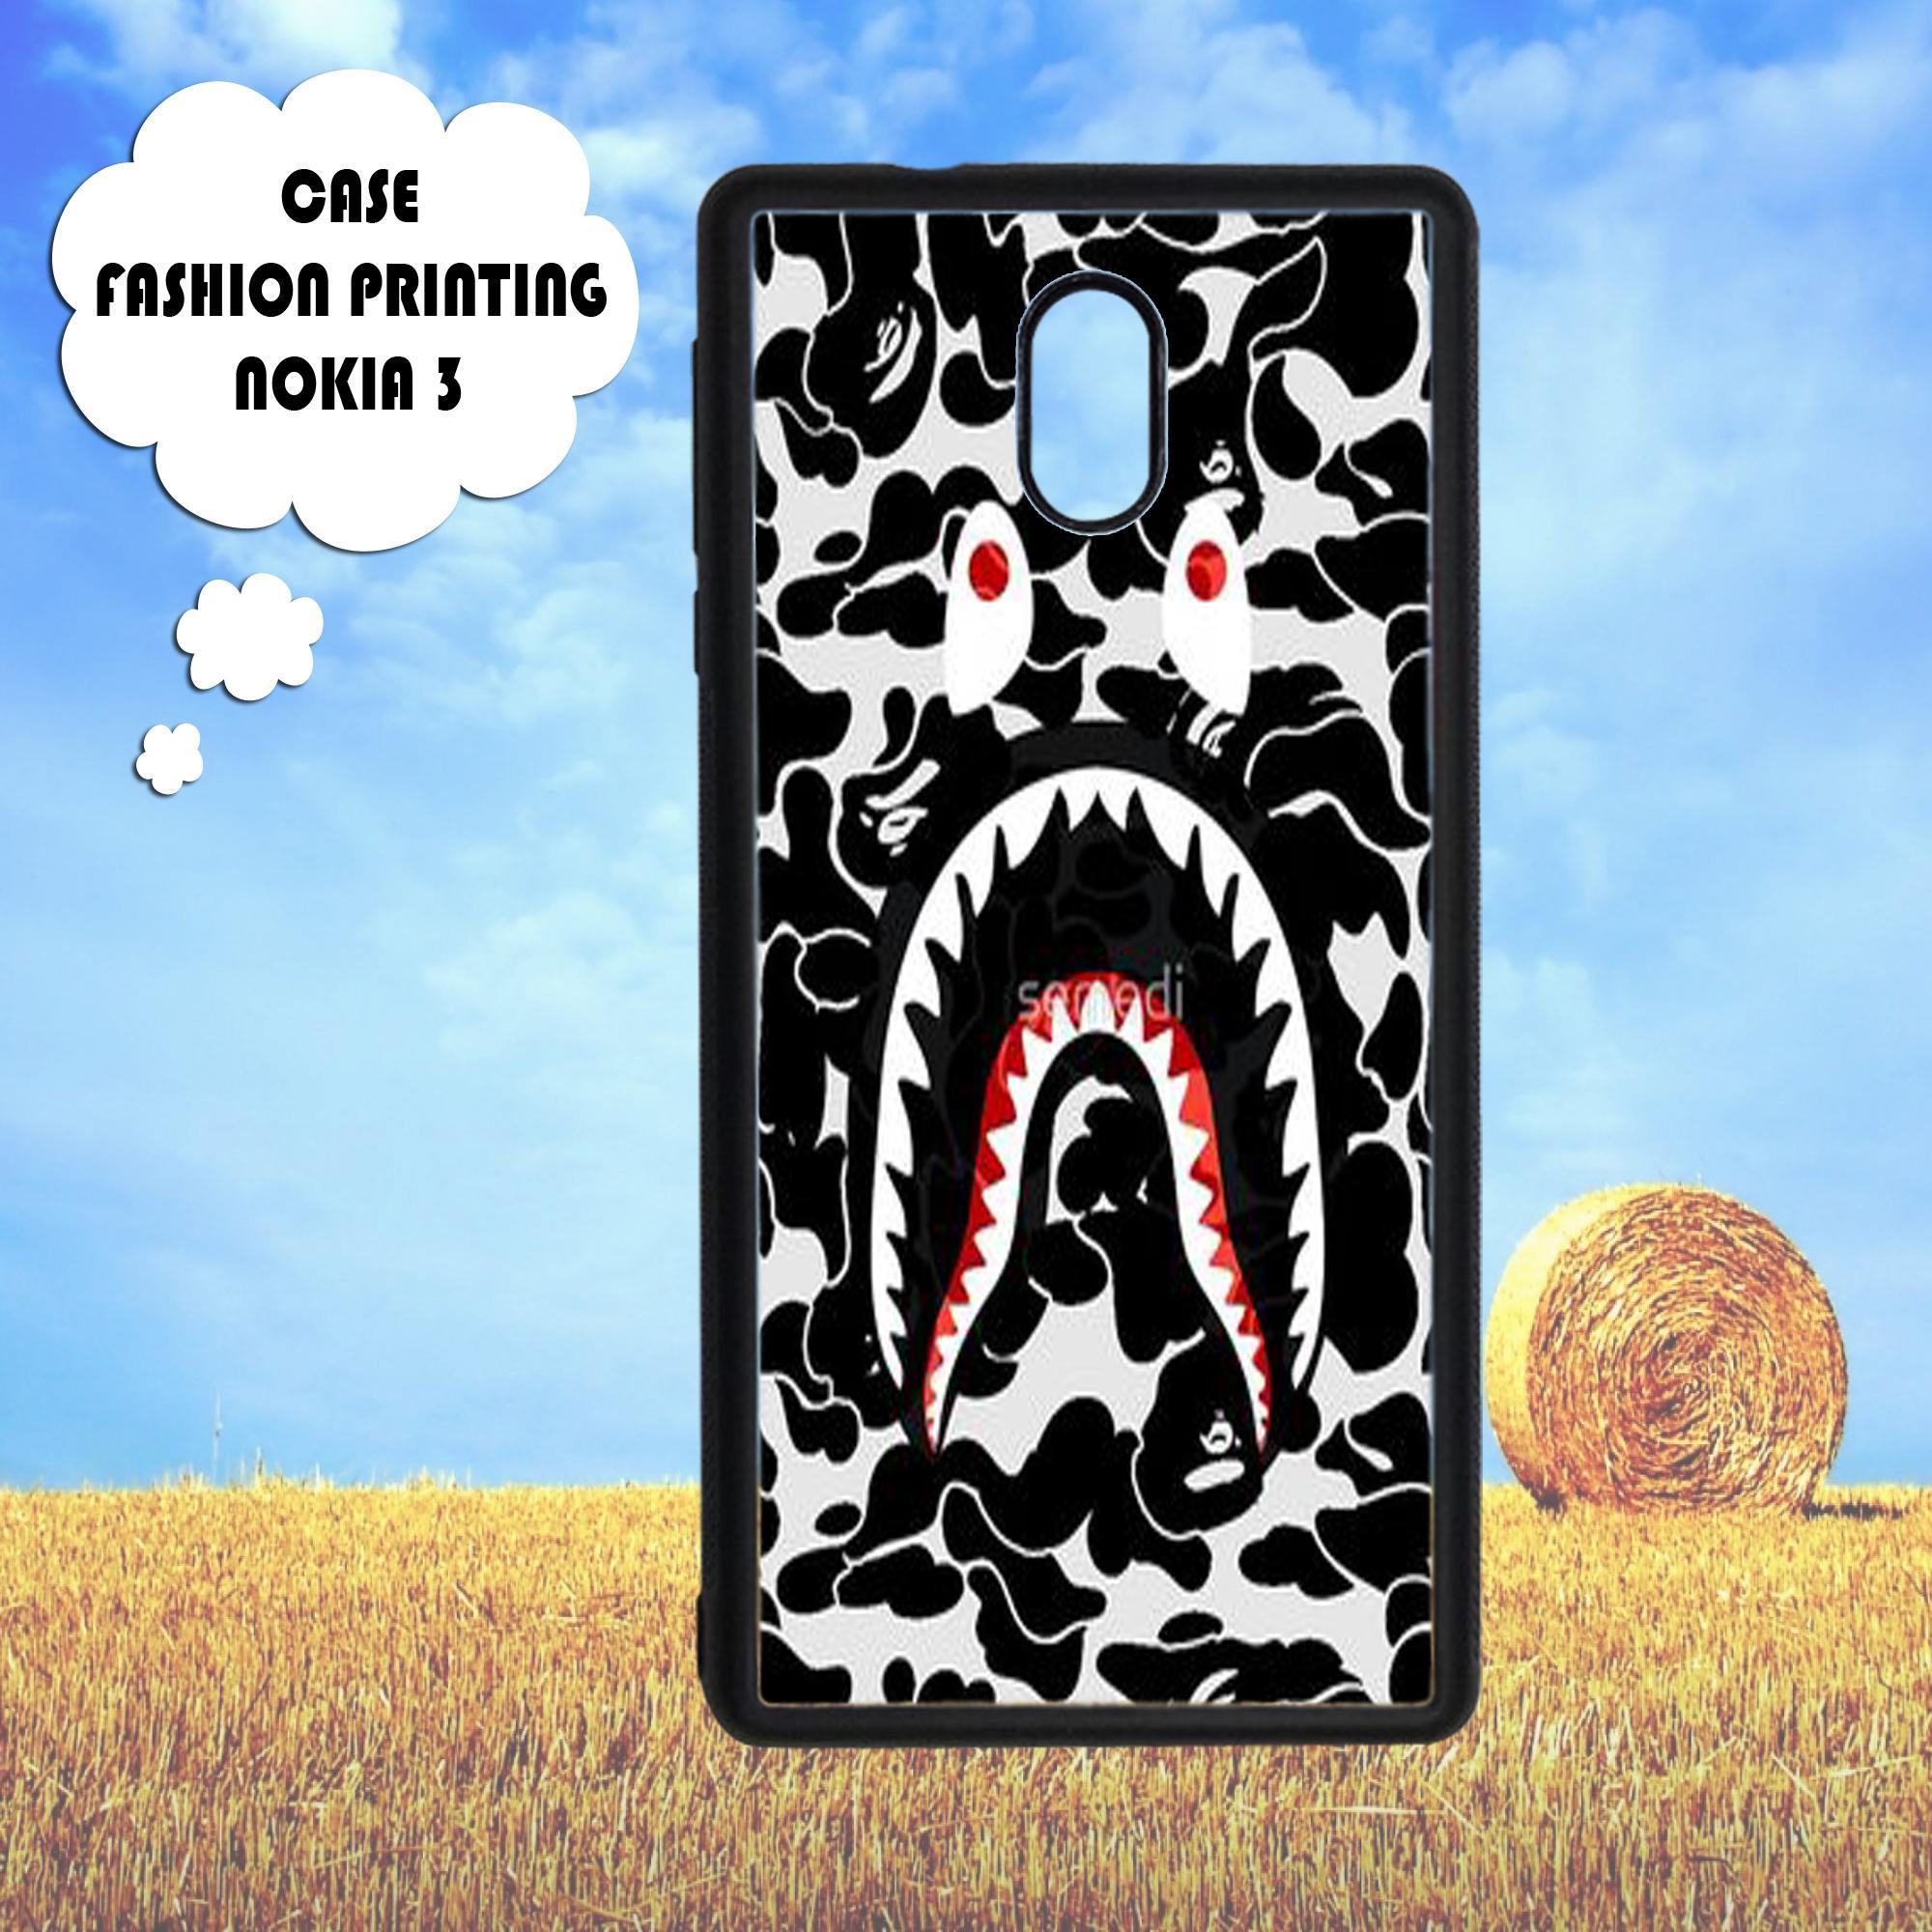 Rajamurah fasion printing case Nokia3 - 11